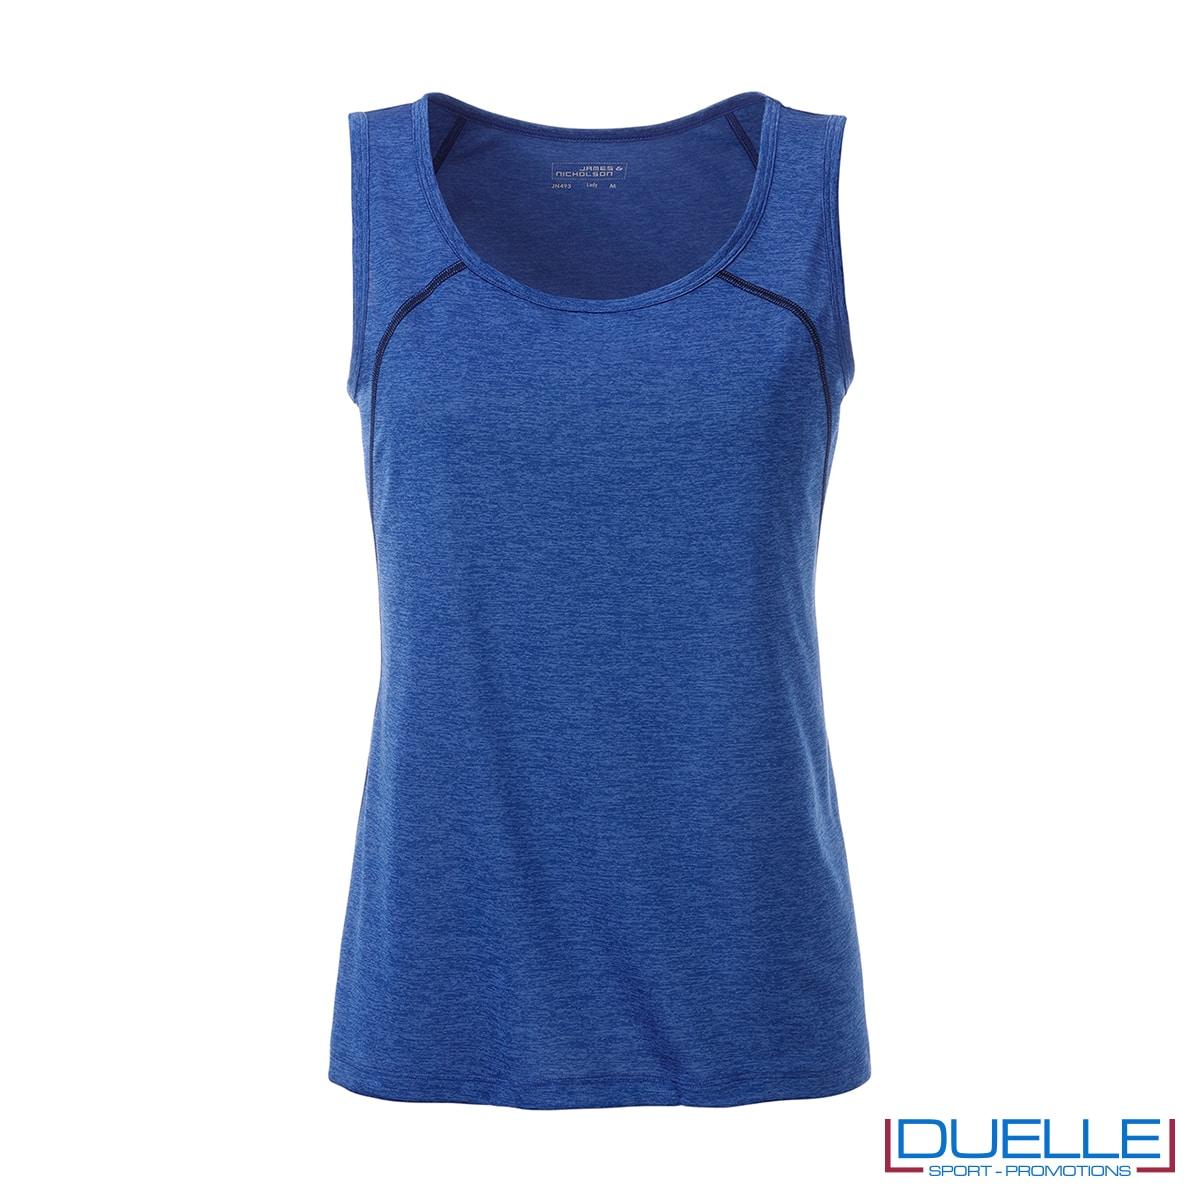 Canotta donna sport traspirante colore blu melange